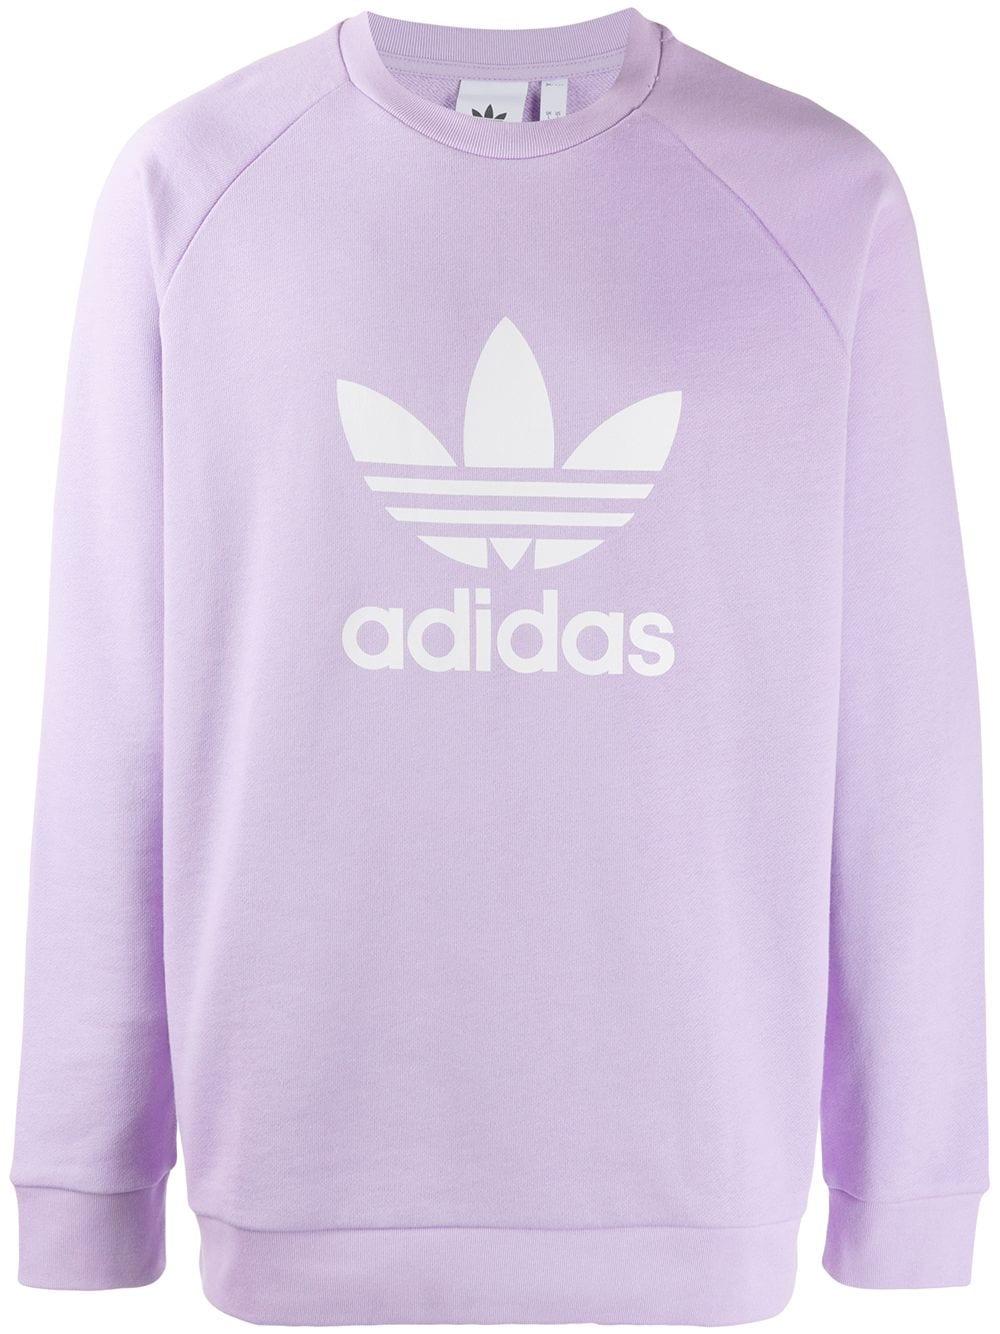 Adidas Originals Adidas Purple Glow Sweatshirt Adidasoriginals Cloth [ 1334 x 1000 Pixel ]